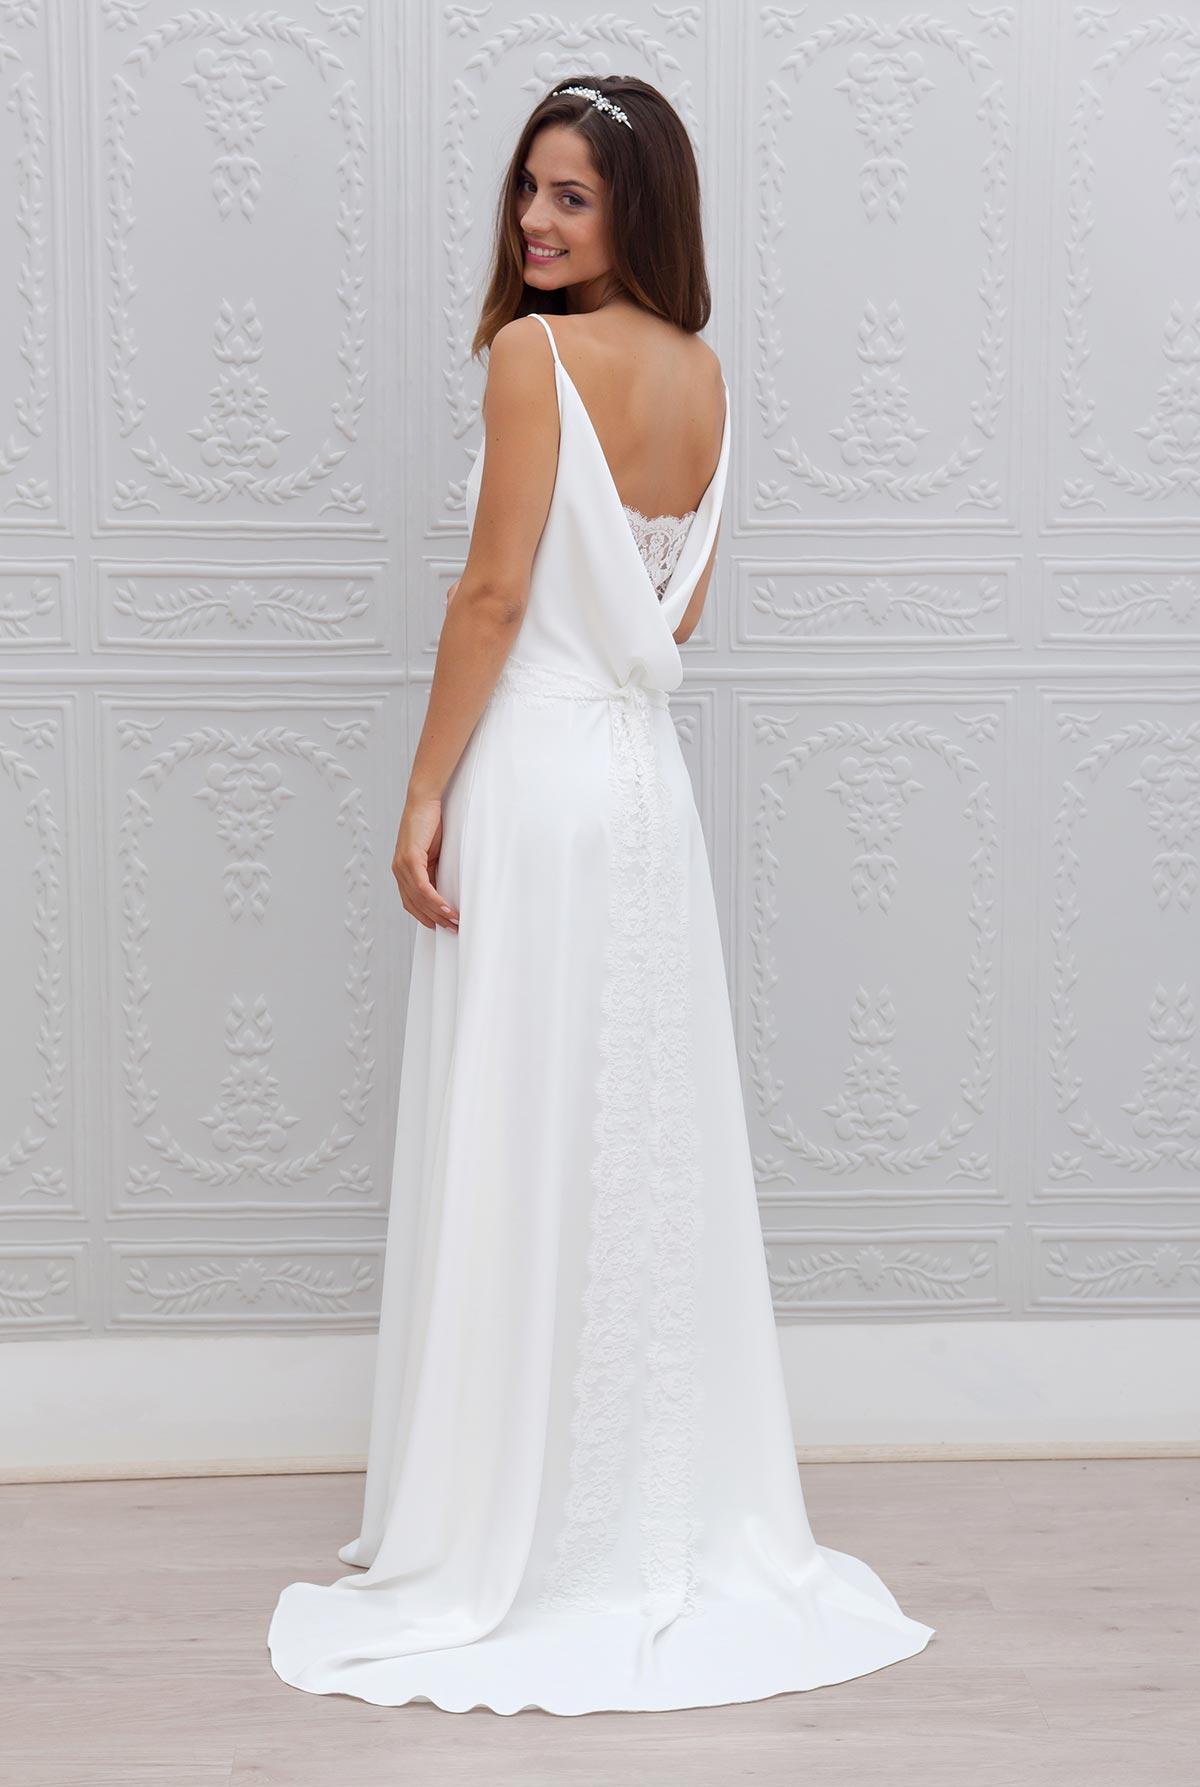 Marie laporte robe georgia